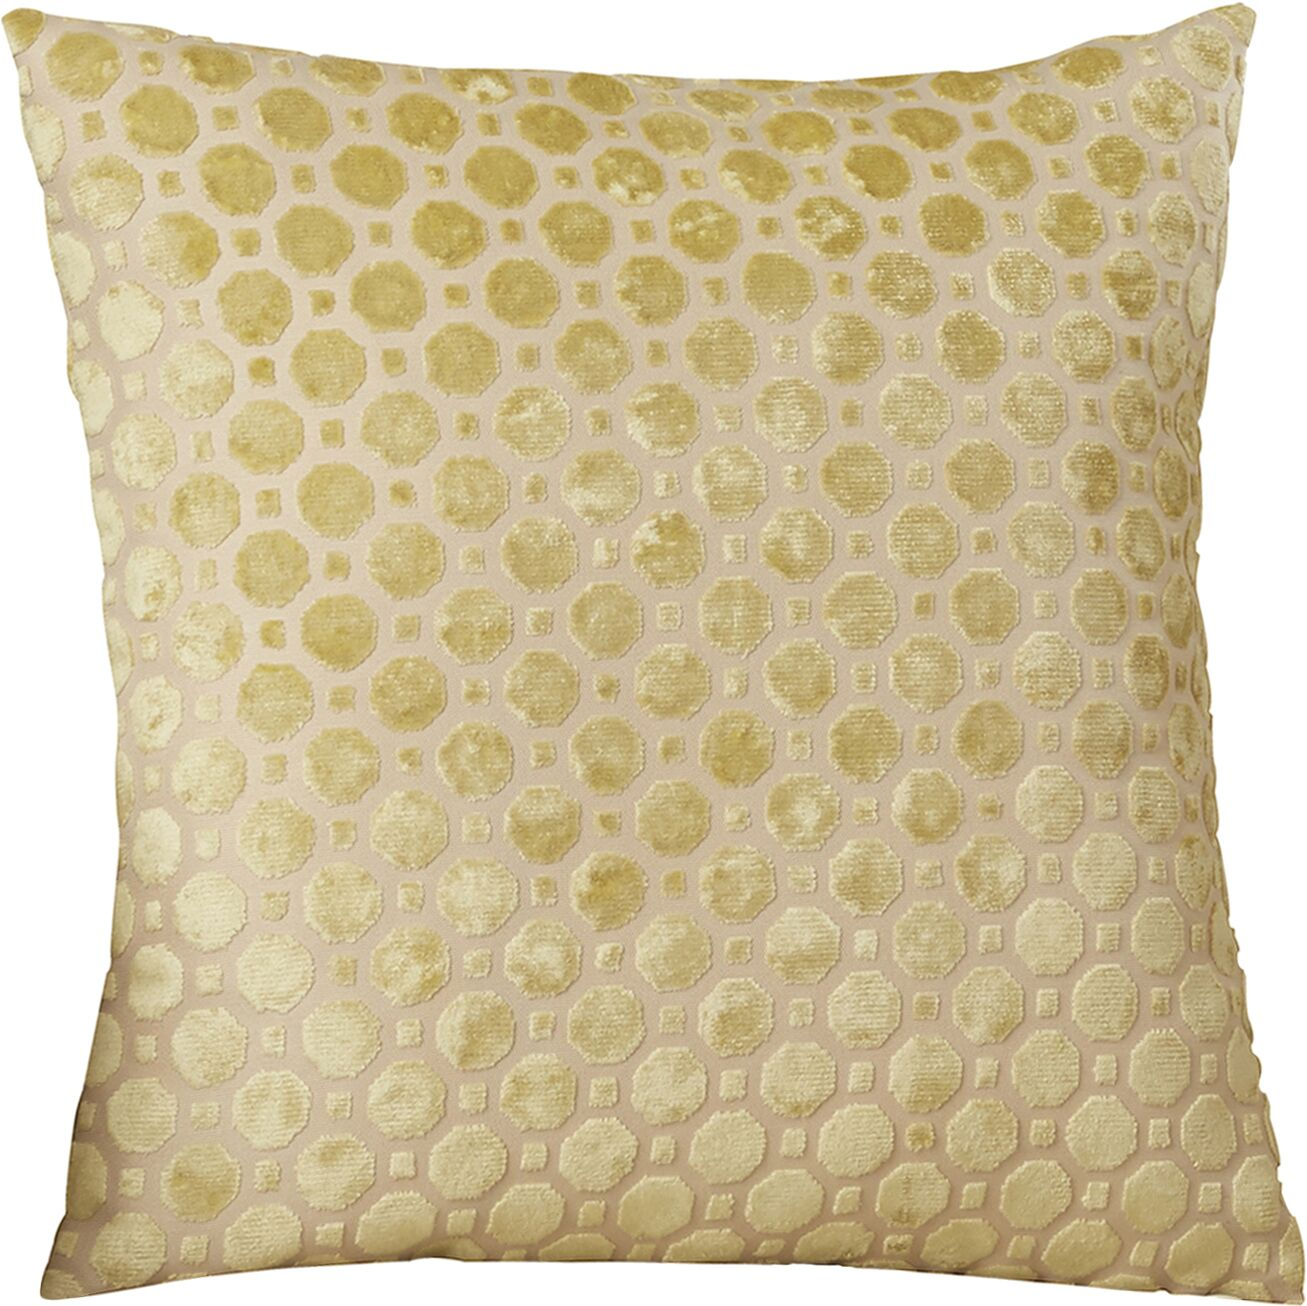 Carlie Velvet Throw Pillow Color: Citrine, Size: 18